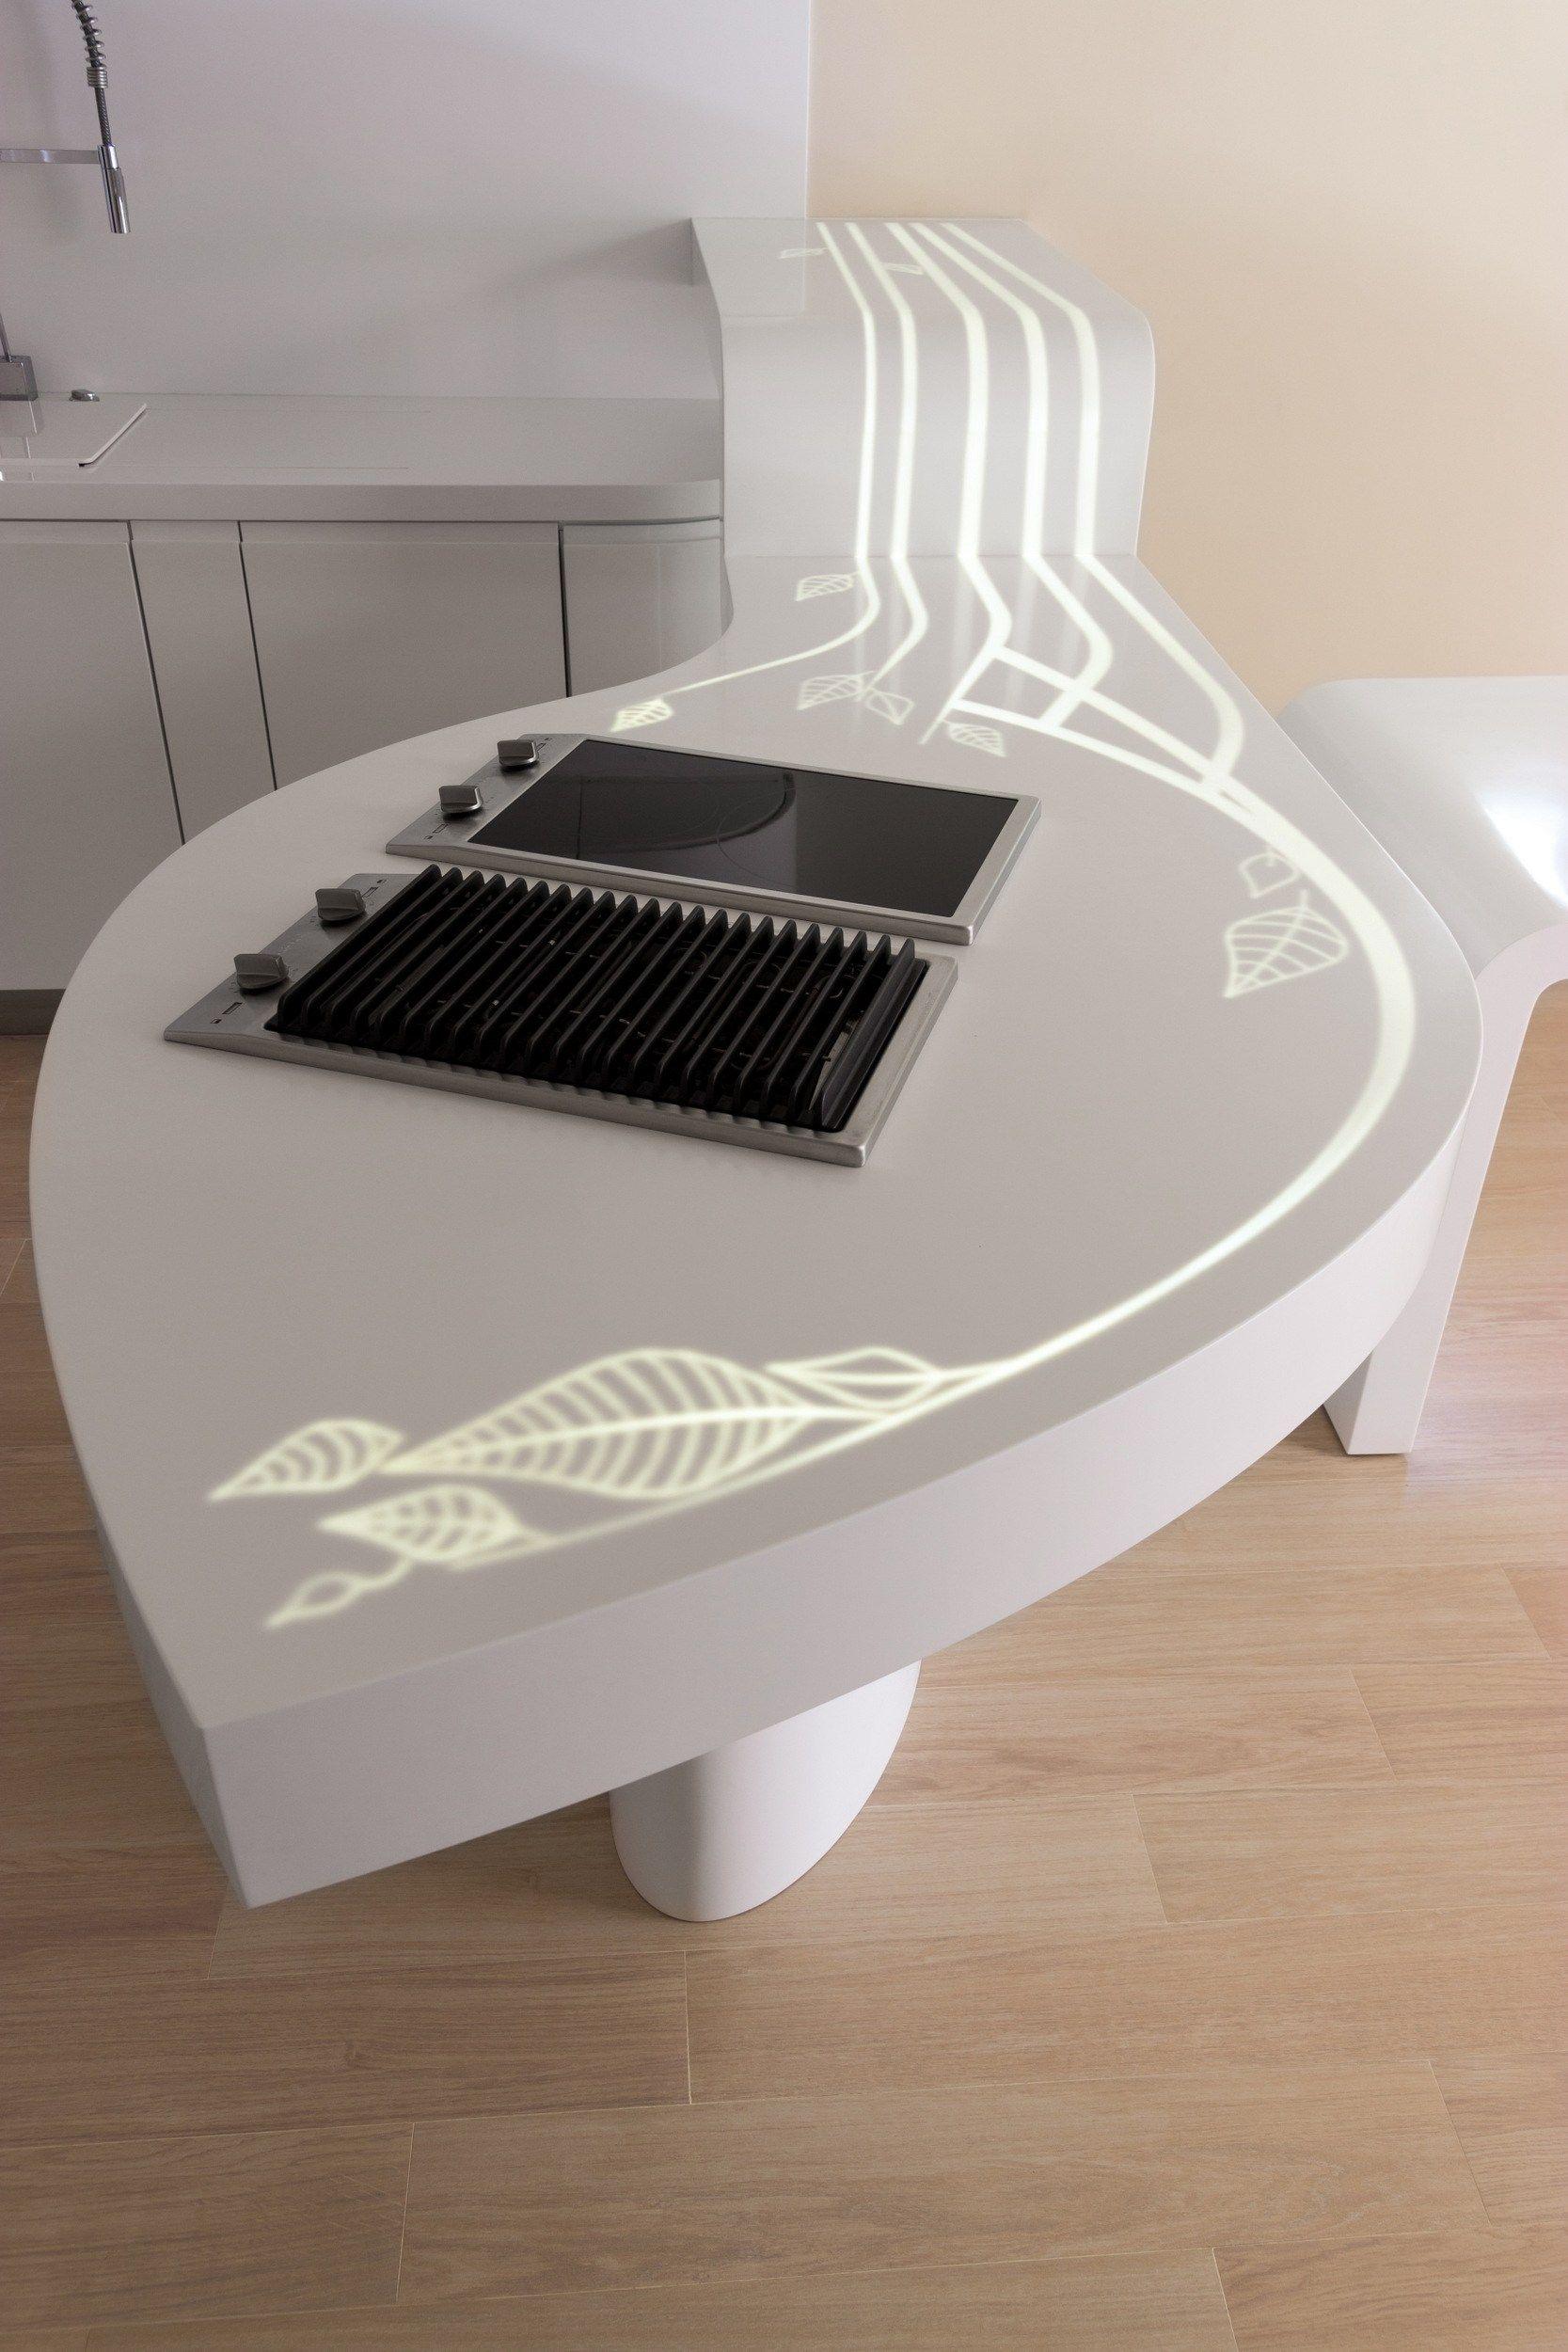 Top cucina in HI-MACS® by HI-MACS® by LG Hausys Europe | cORIAN ...